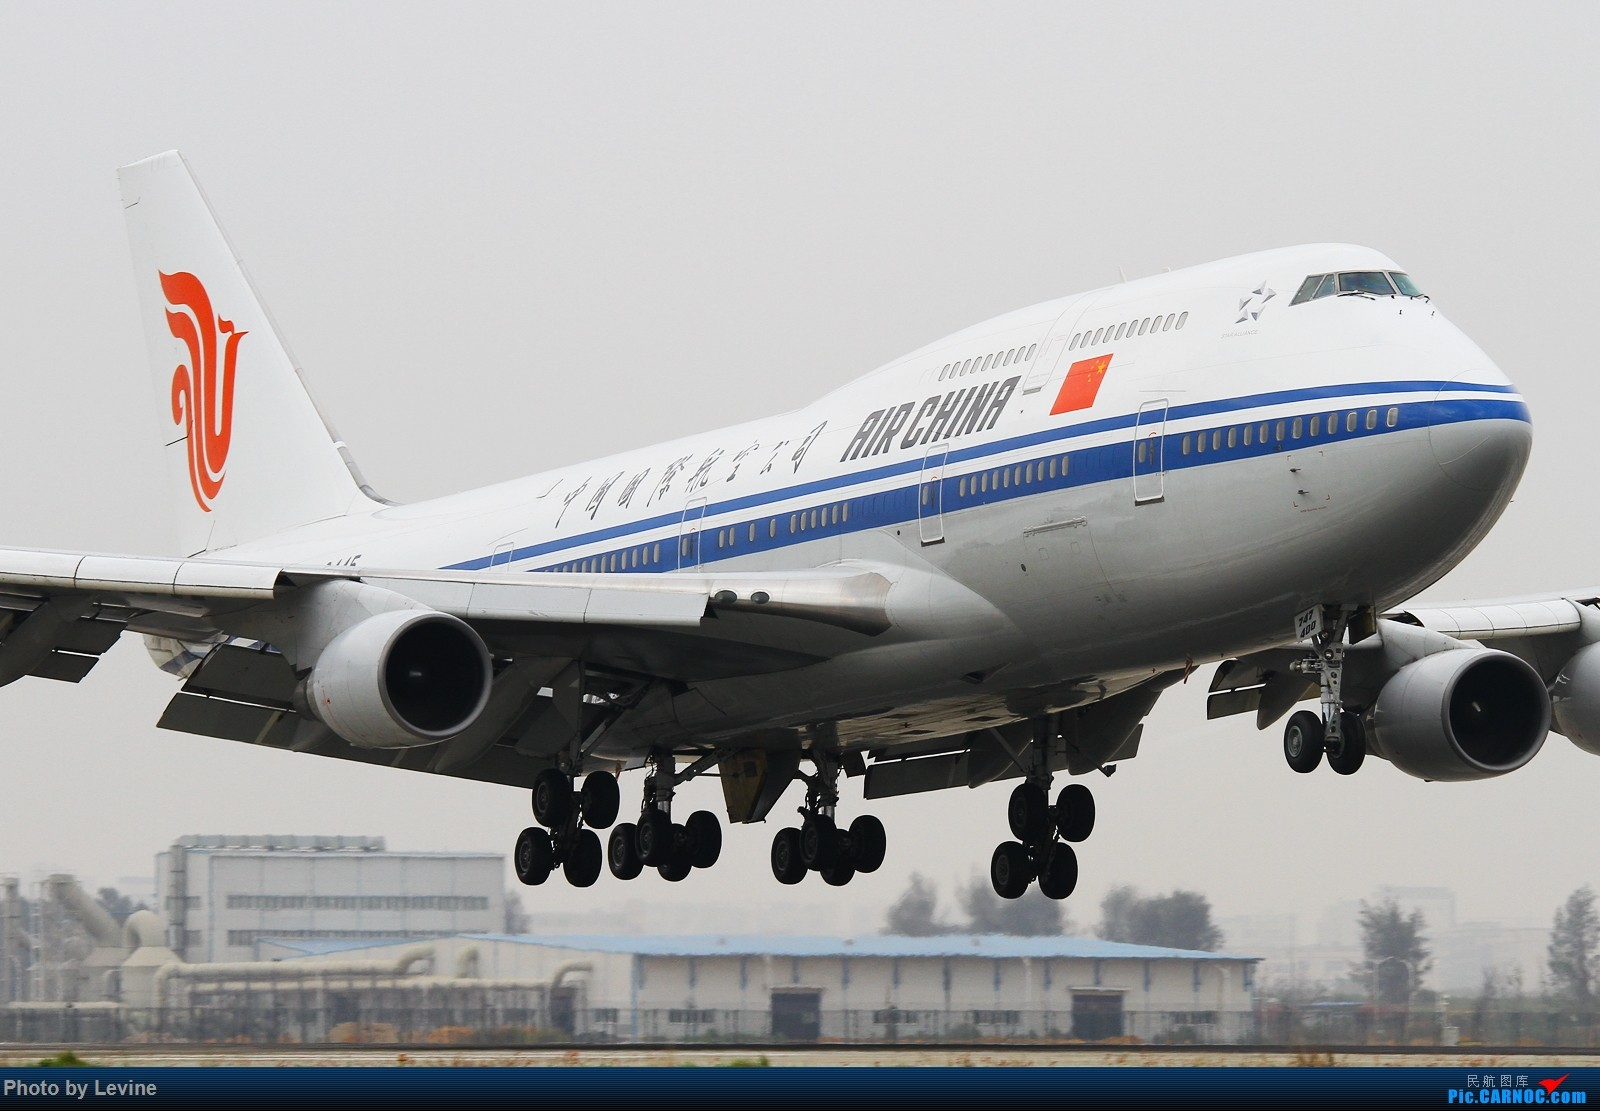 Re:[原创]]◇ ◆ ◇ ◆ ◇ ◆坏天气下的两大块头◇ ◆ ◇ ◆ ◇ ◆ BOEING 747-400 B-2445 中国深圳宝安国际机场